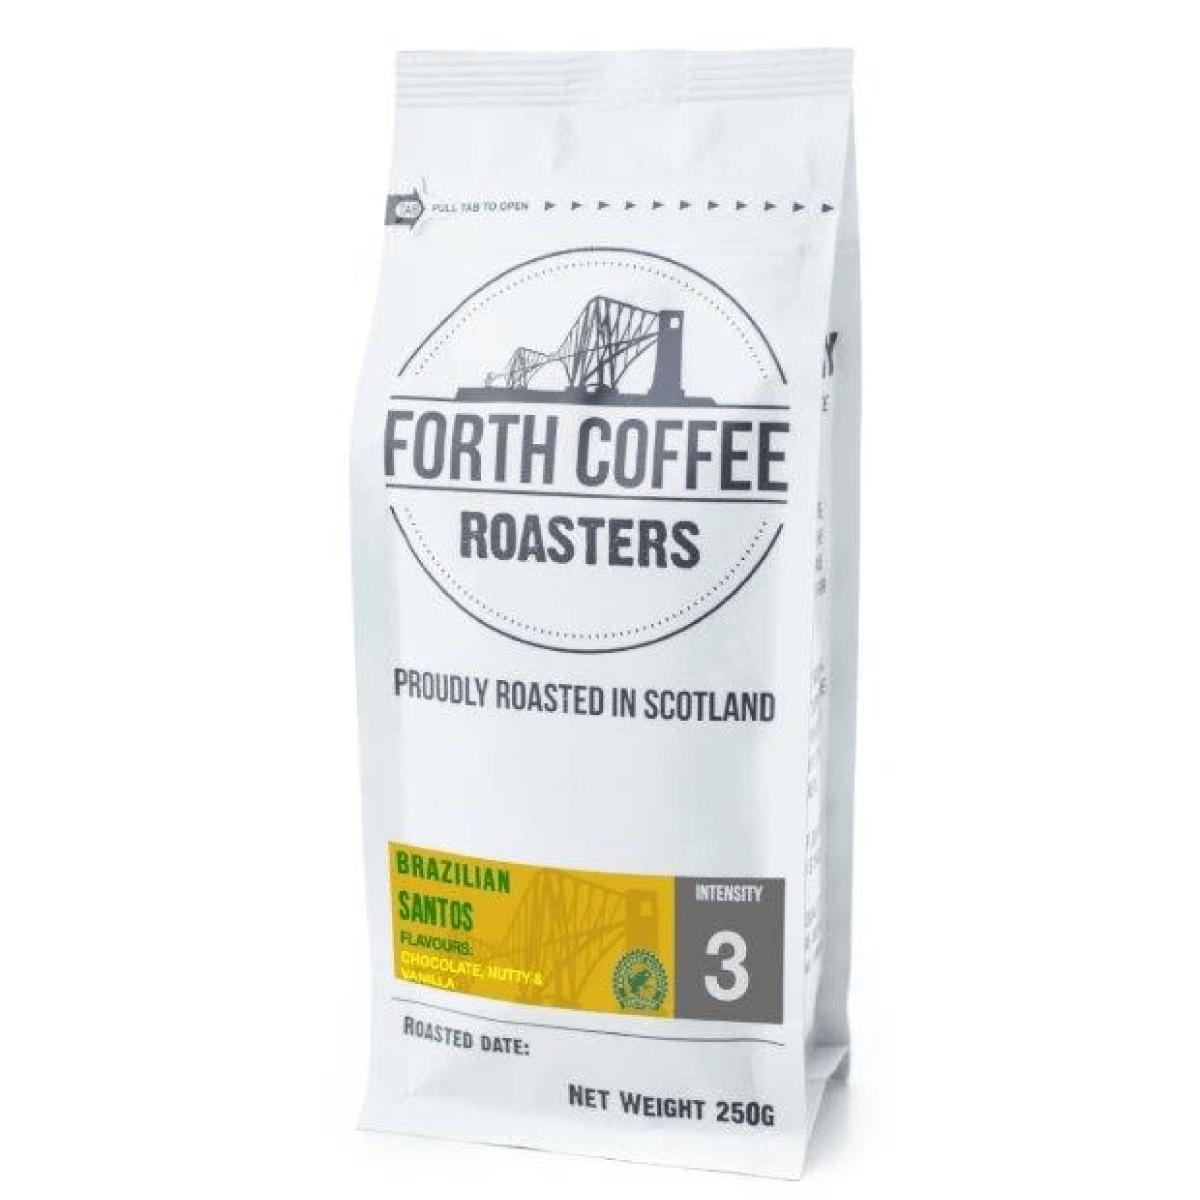 Forth Coffee - Brazilian Santos Coffee Roasted in Scotland